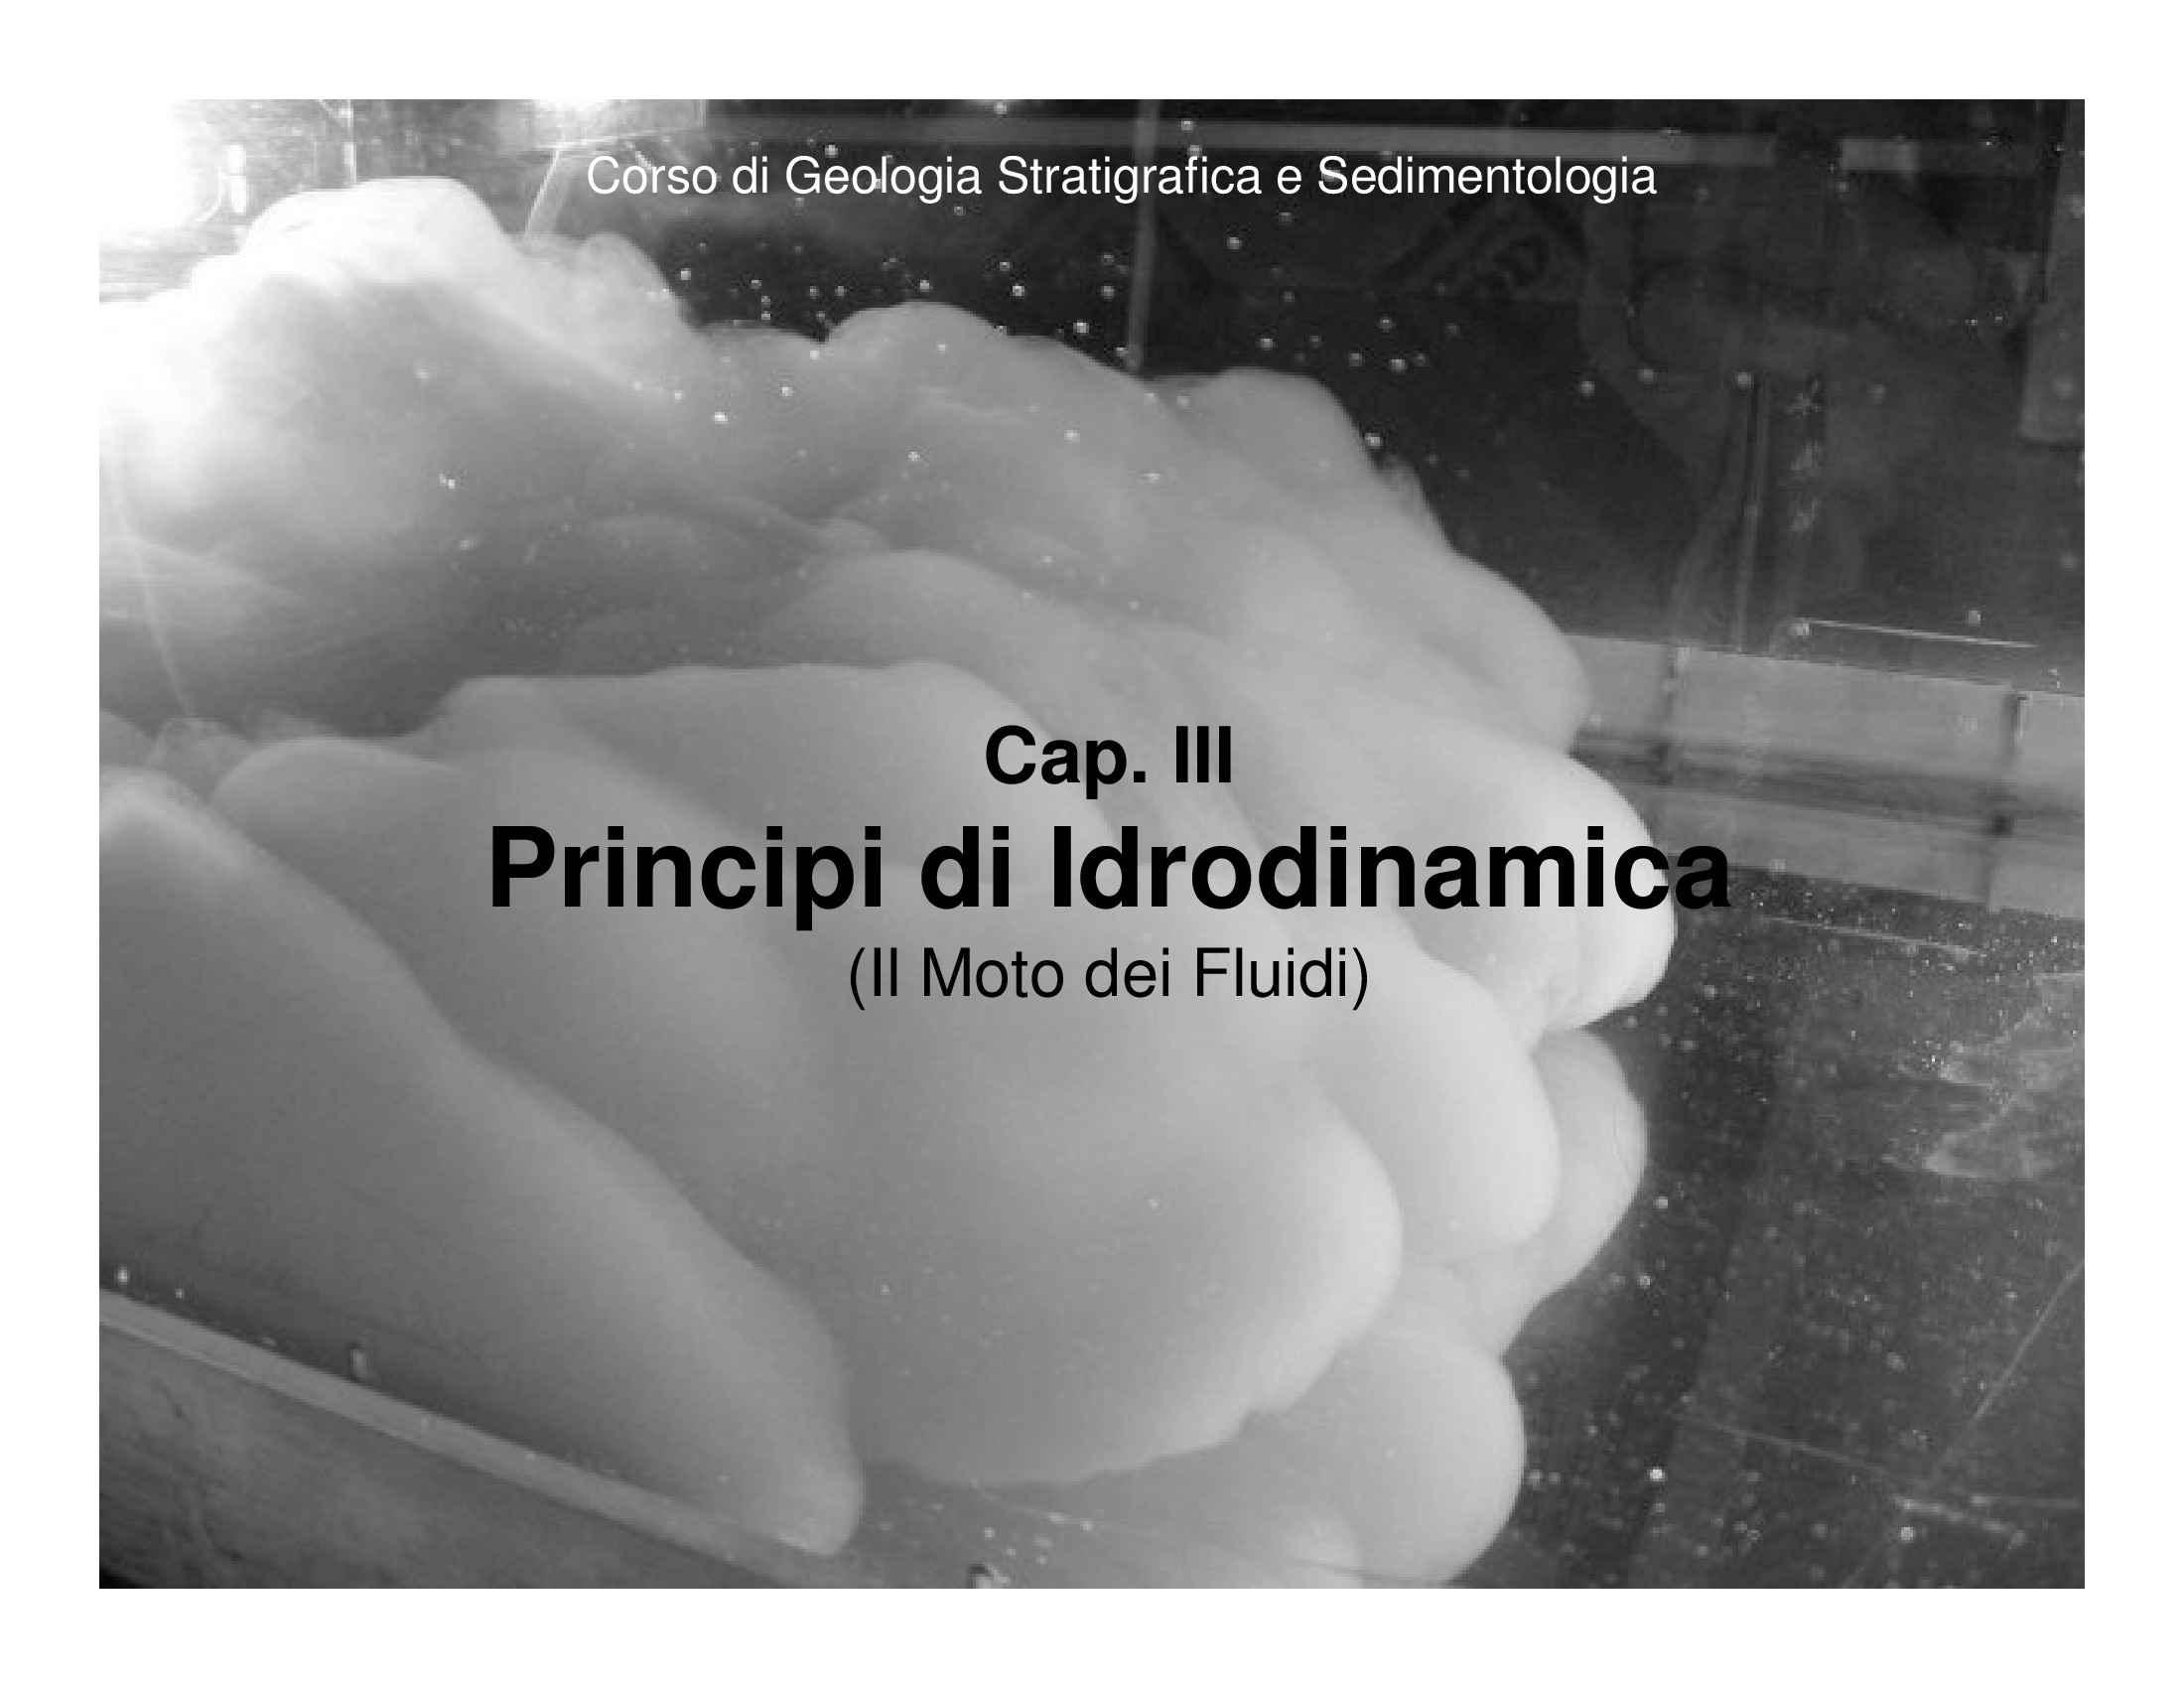 Principi di idrodinamica